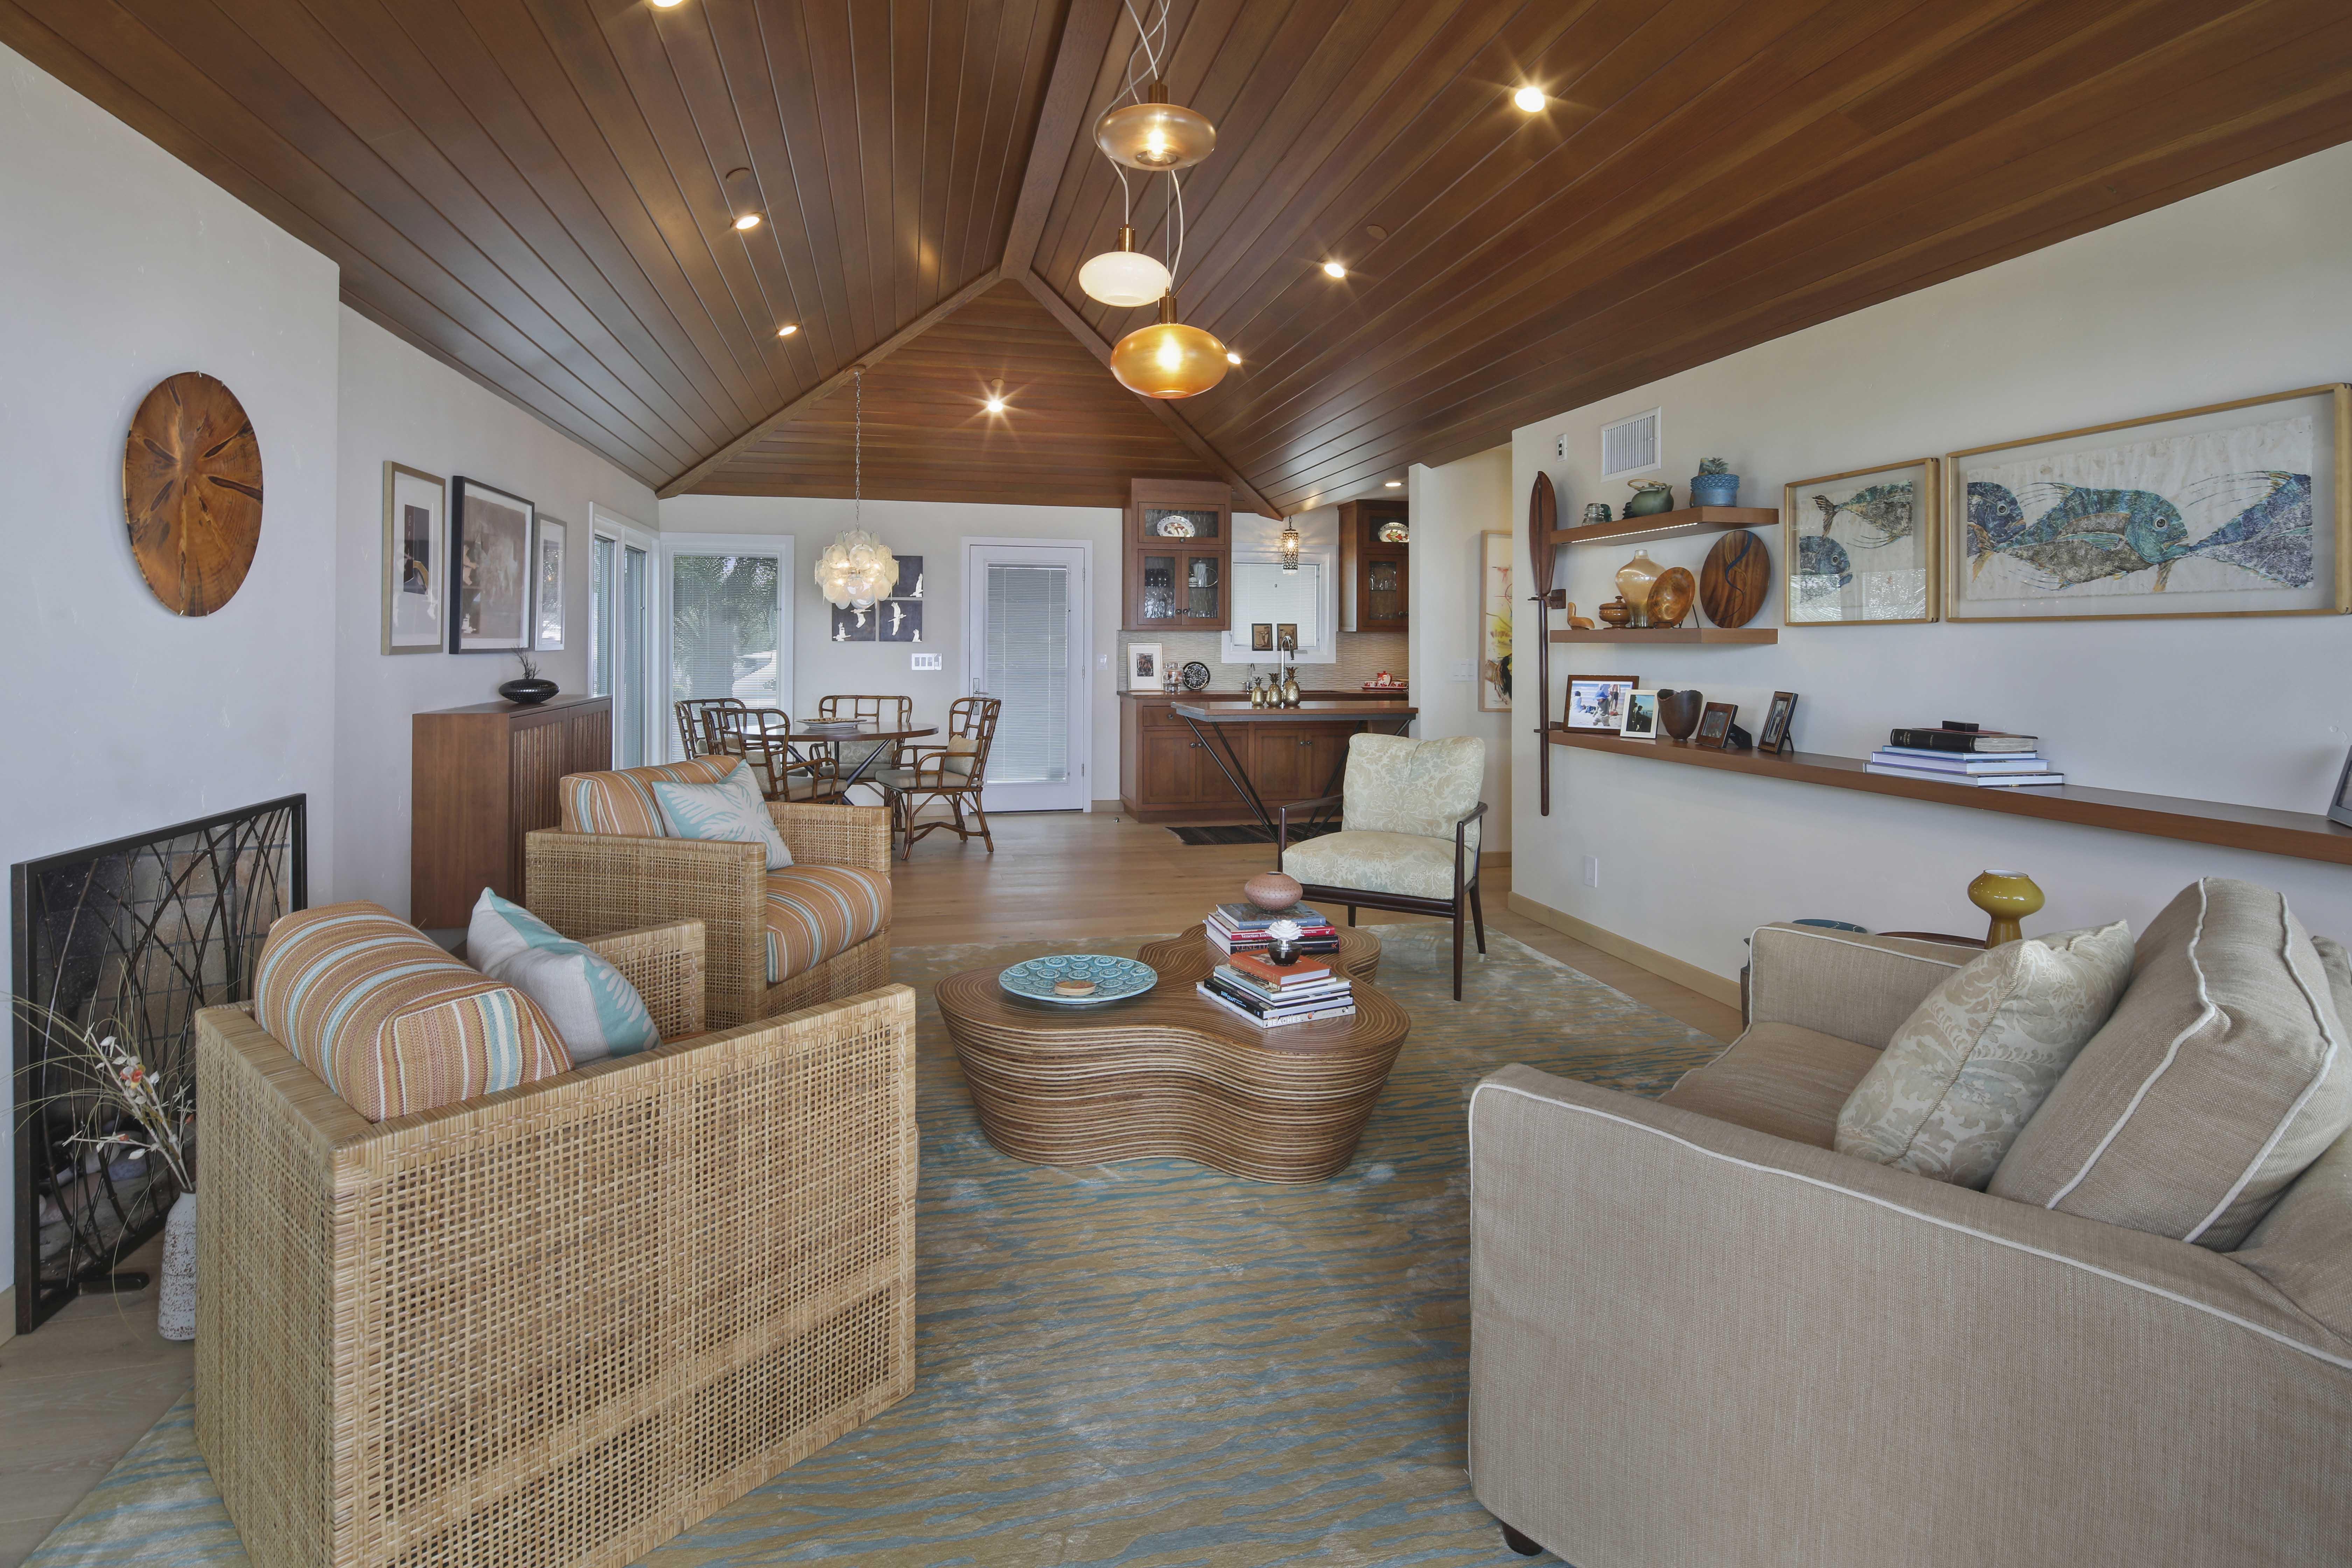 Orange County San Clemente Interior Design Library & Nook